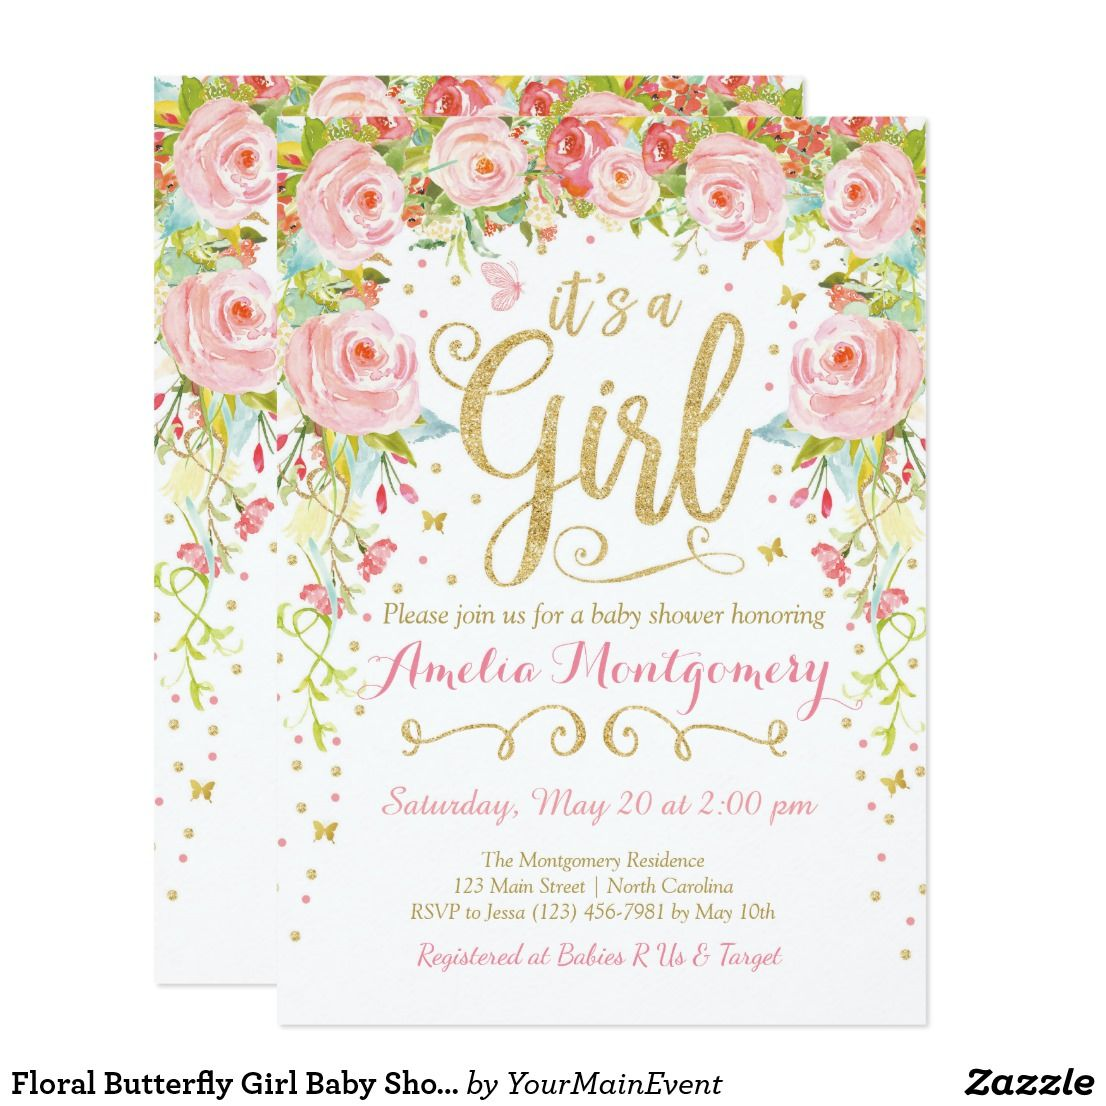 Floral Butterfly Girl Baby Shower Invitation   Pinterest   Shower ...